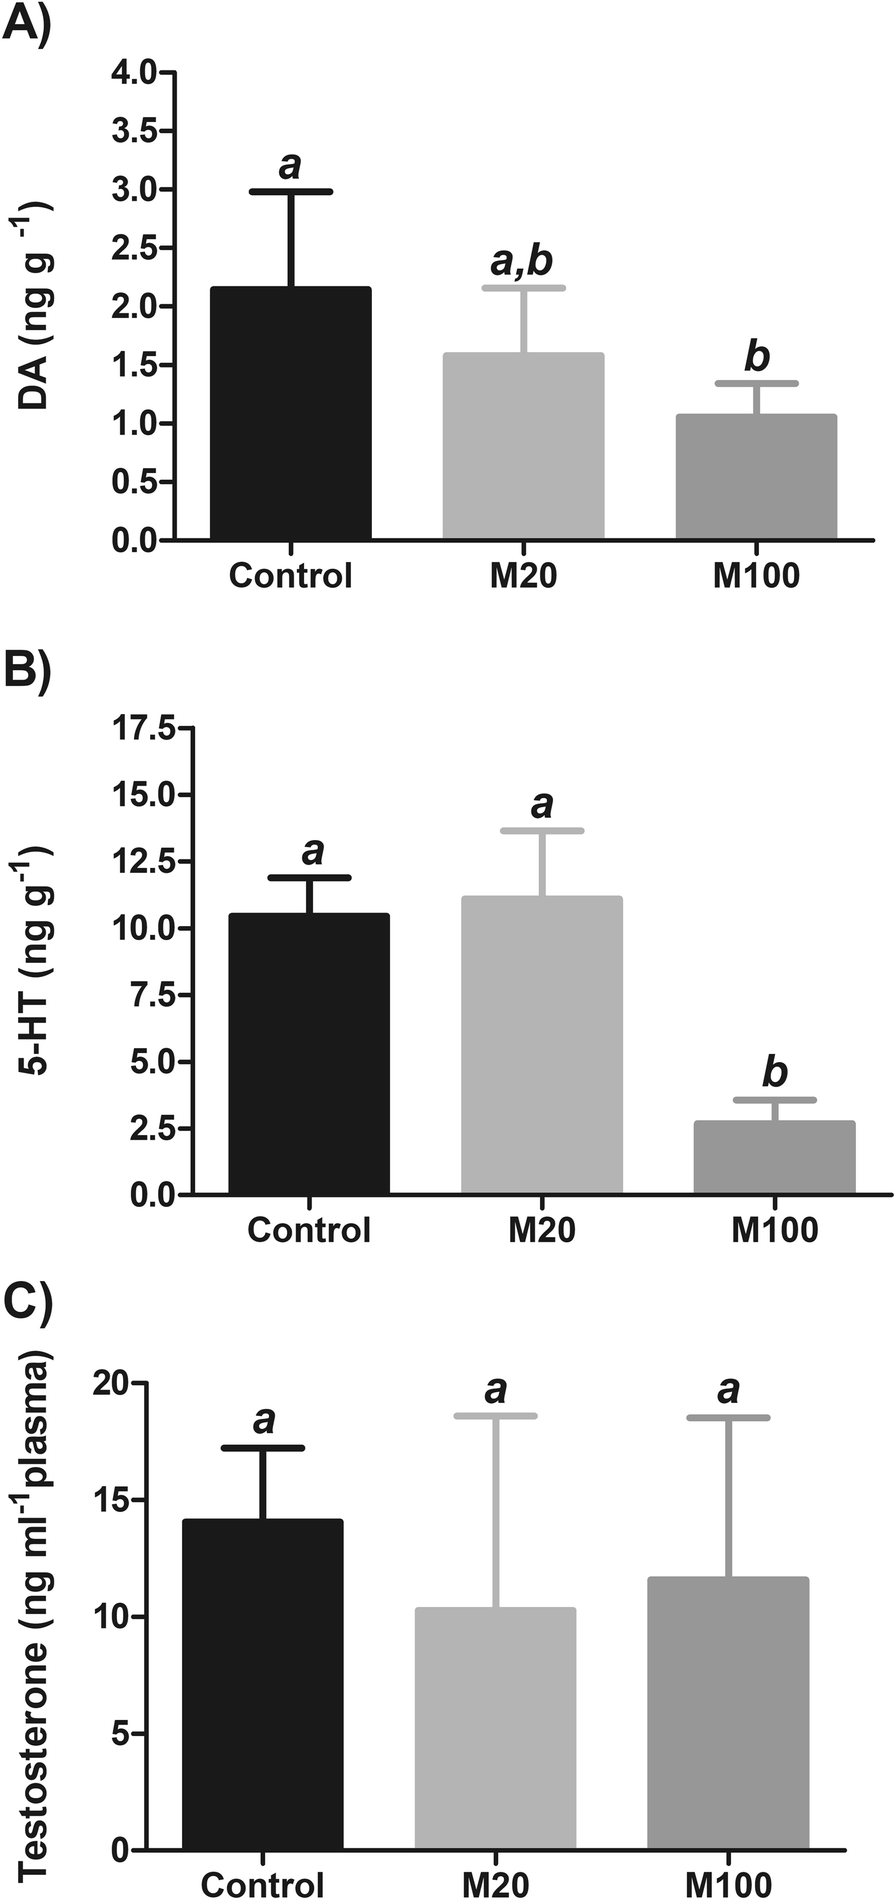 Effects of methylphenidate on the aggressive behavior